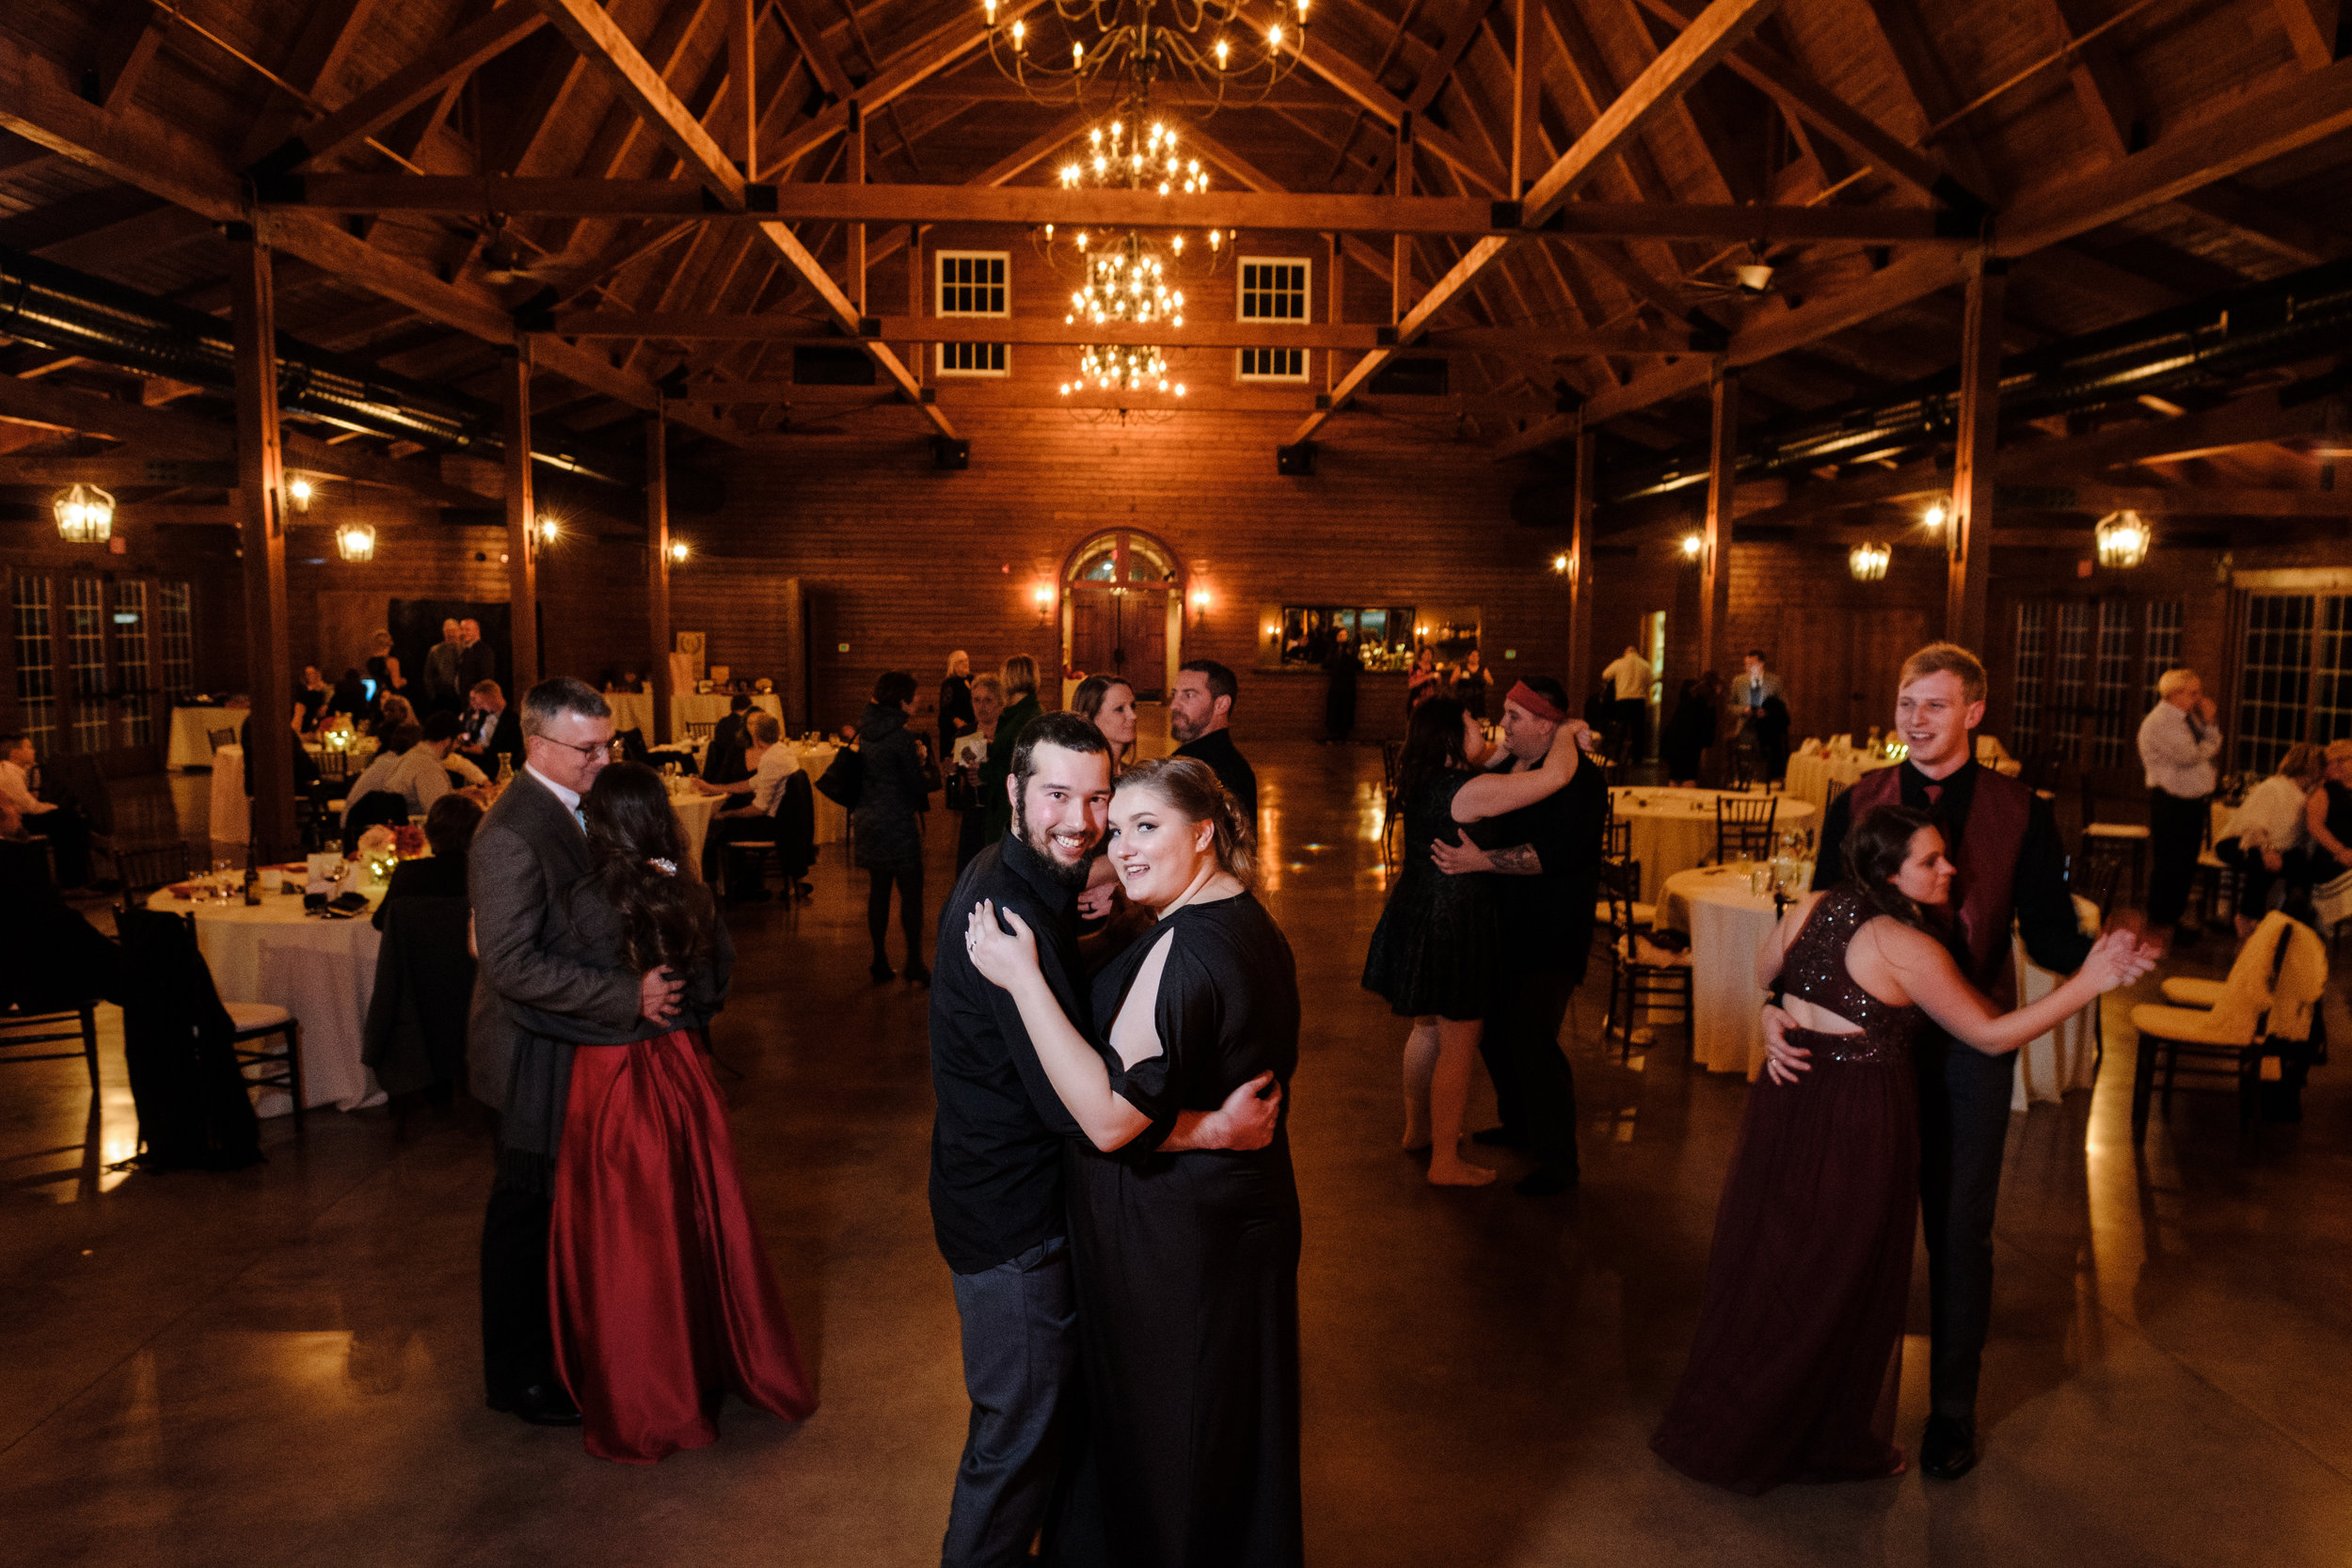 18-12-28 Corinne-Henry-Pavilion-Wedding-692.jpg